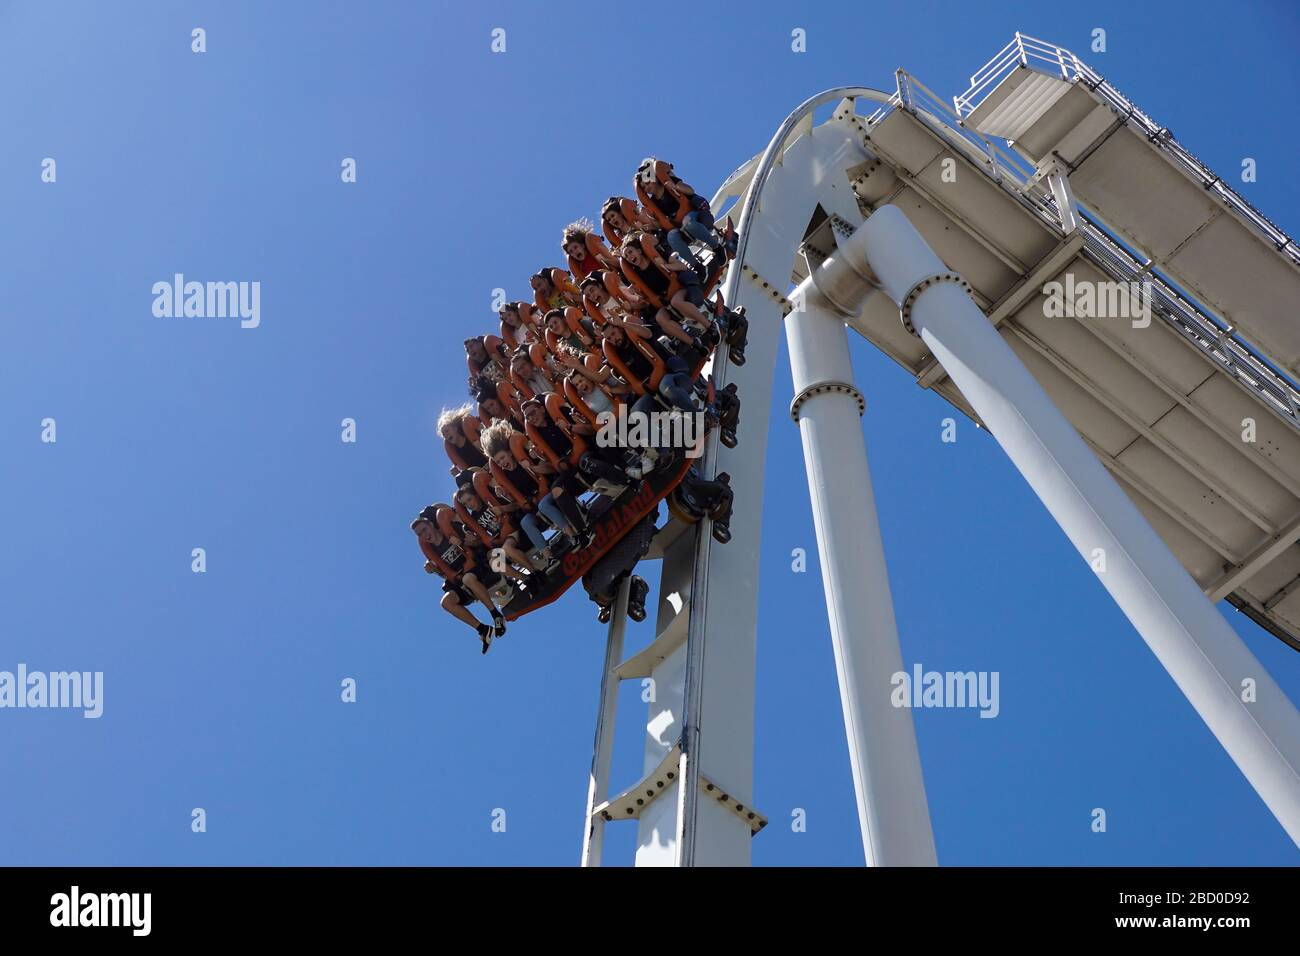 Gardaland, italy 20 june 2019 . Young people screaming during a ride at roller coaster Gardaland park Stock Photo